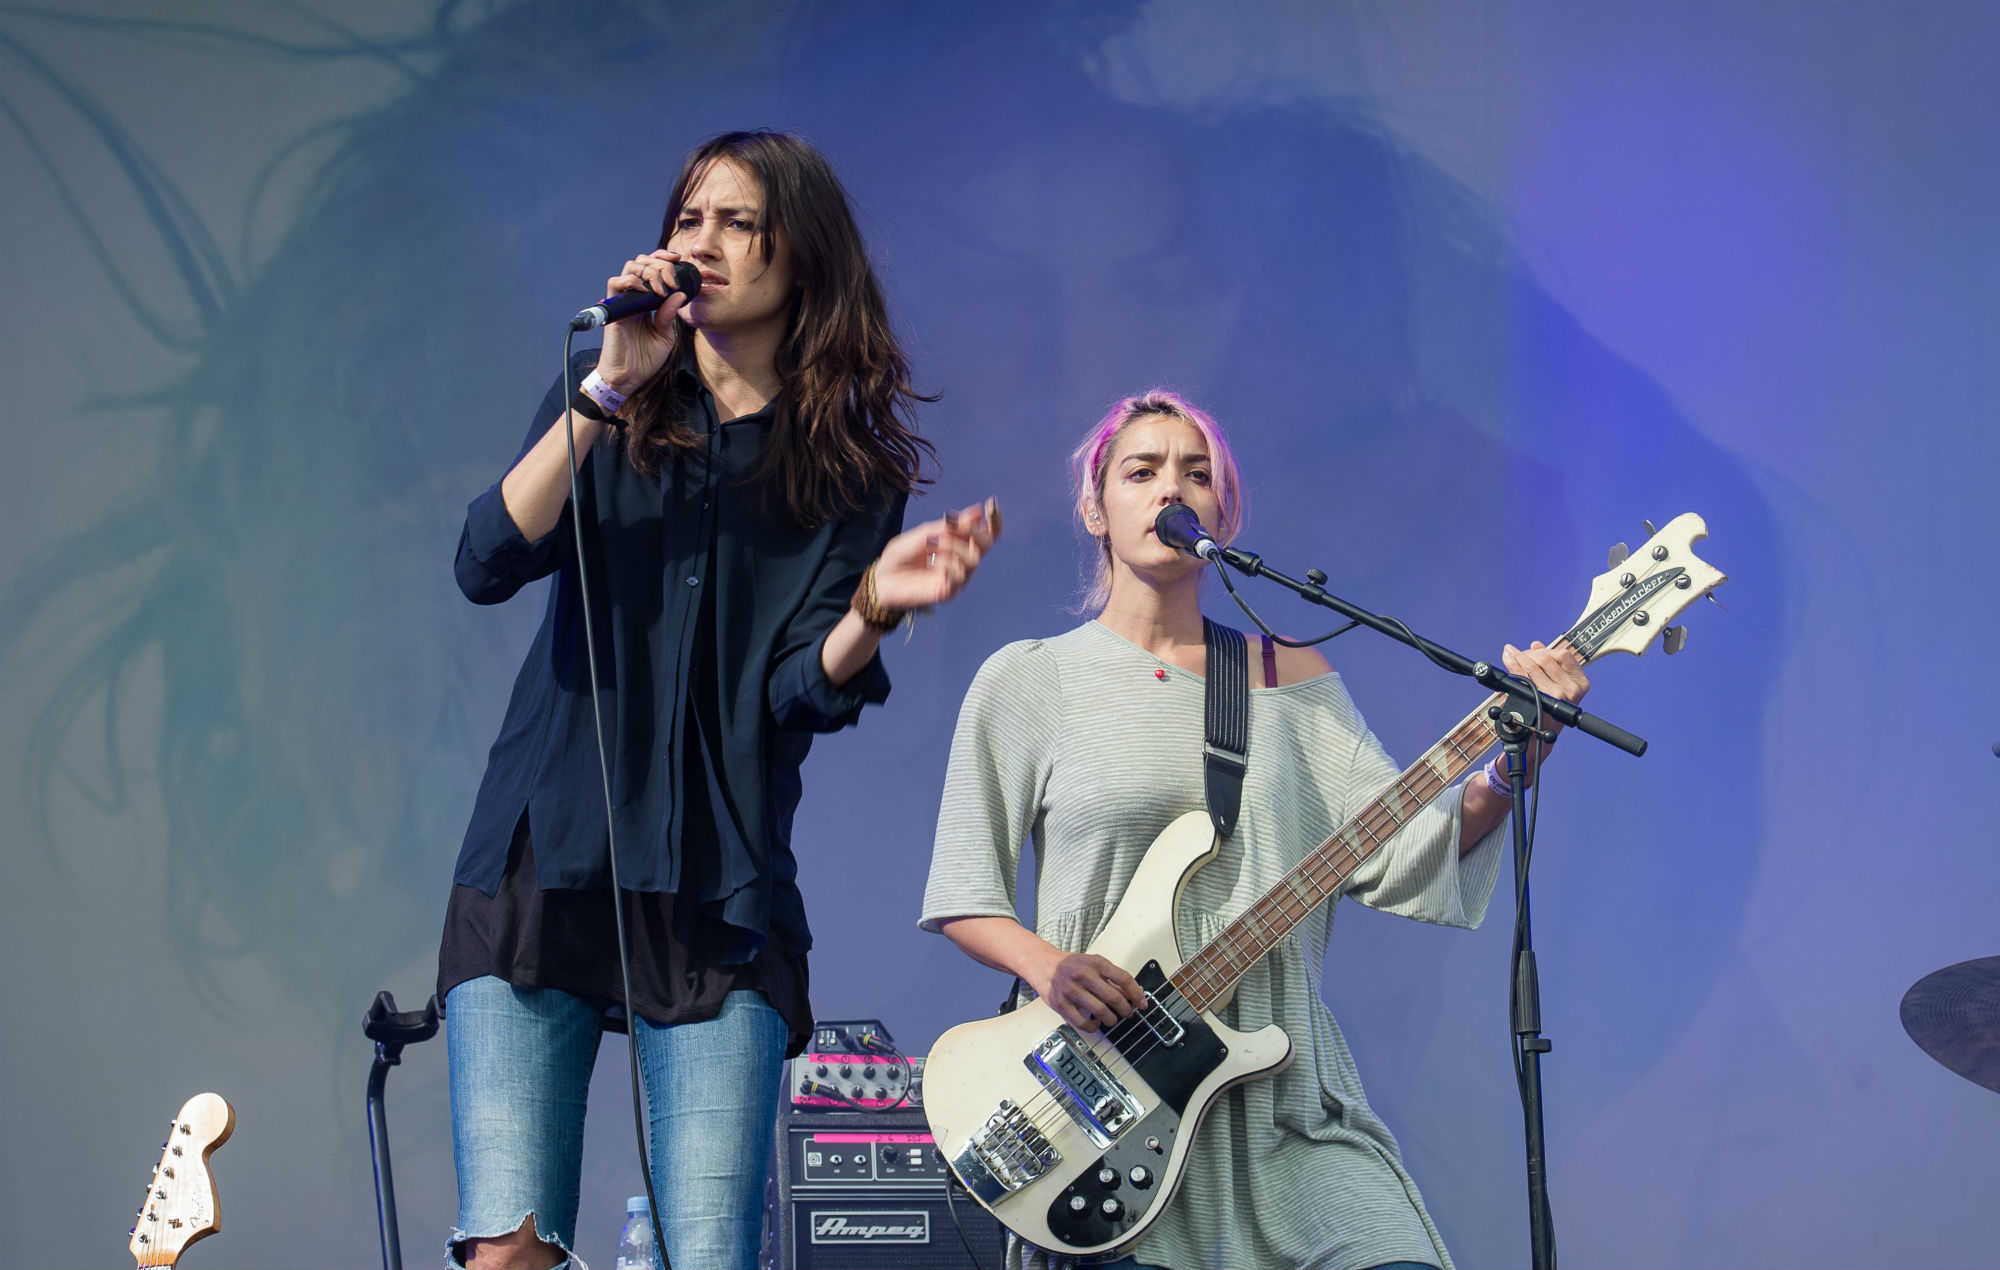 Theresa Wayman and Jenny Lee Lindberg from Warpaint perform at Rock en Seine Festival (2014)